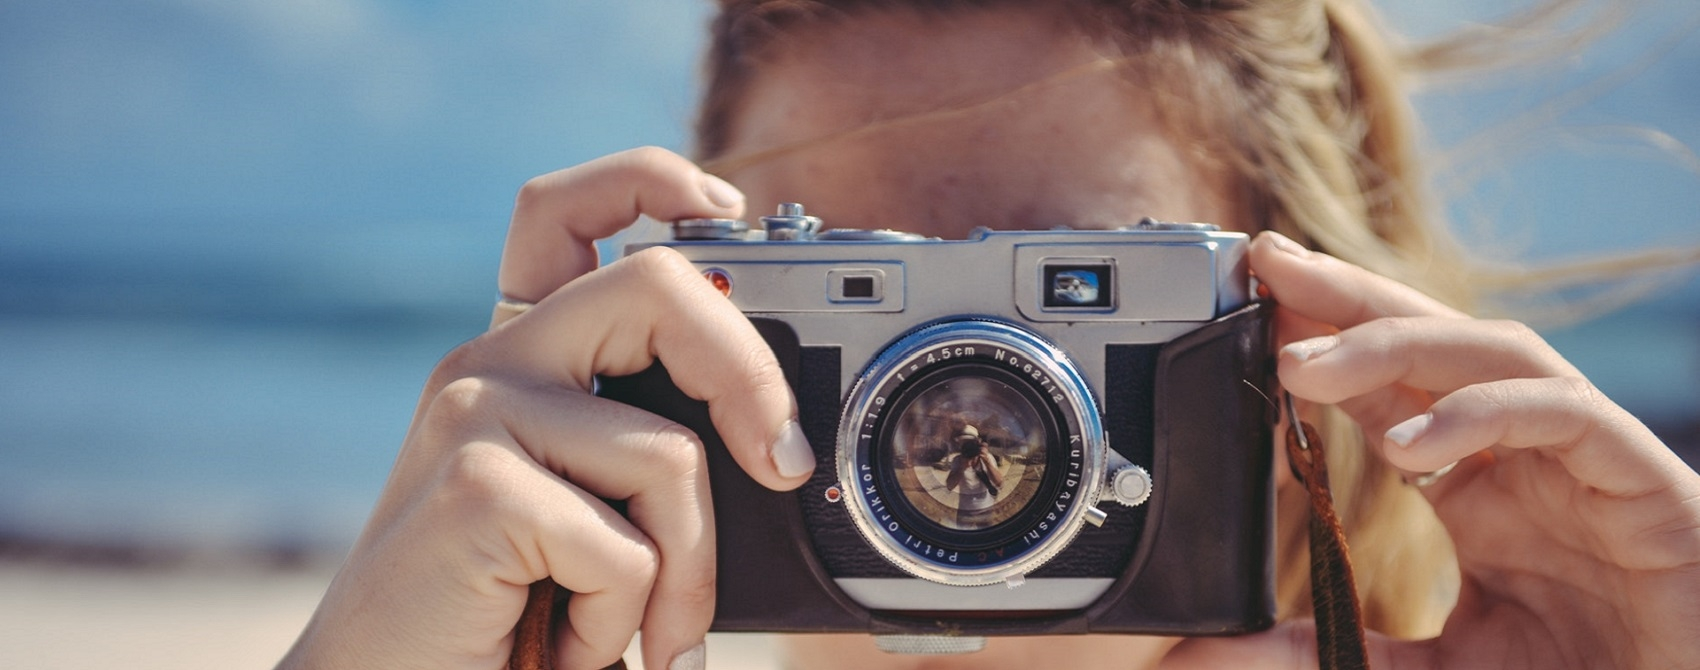 Photography Contest.jpg